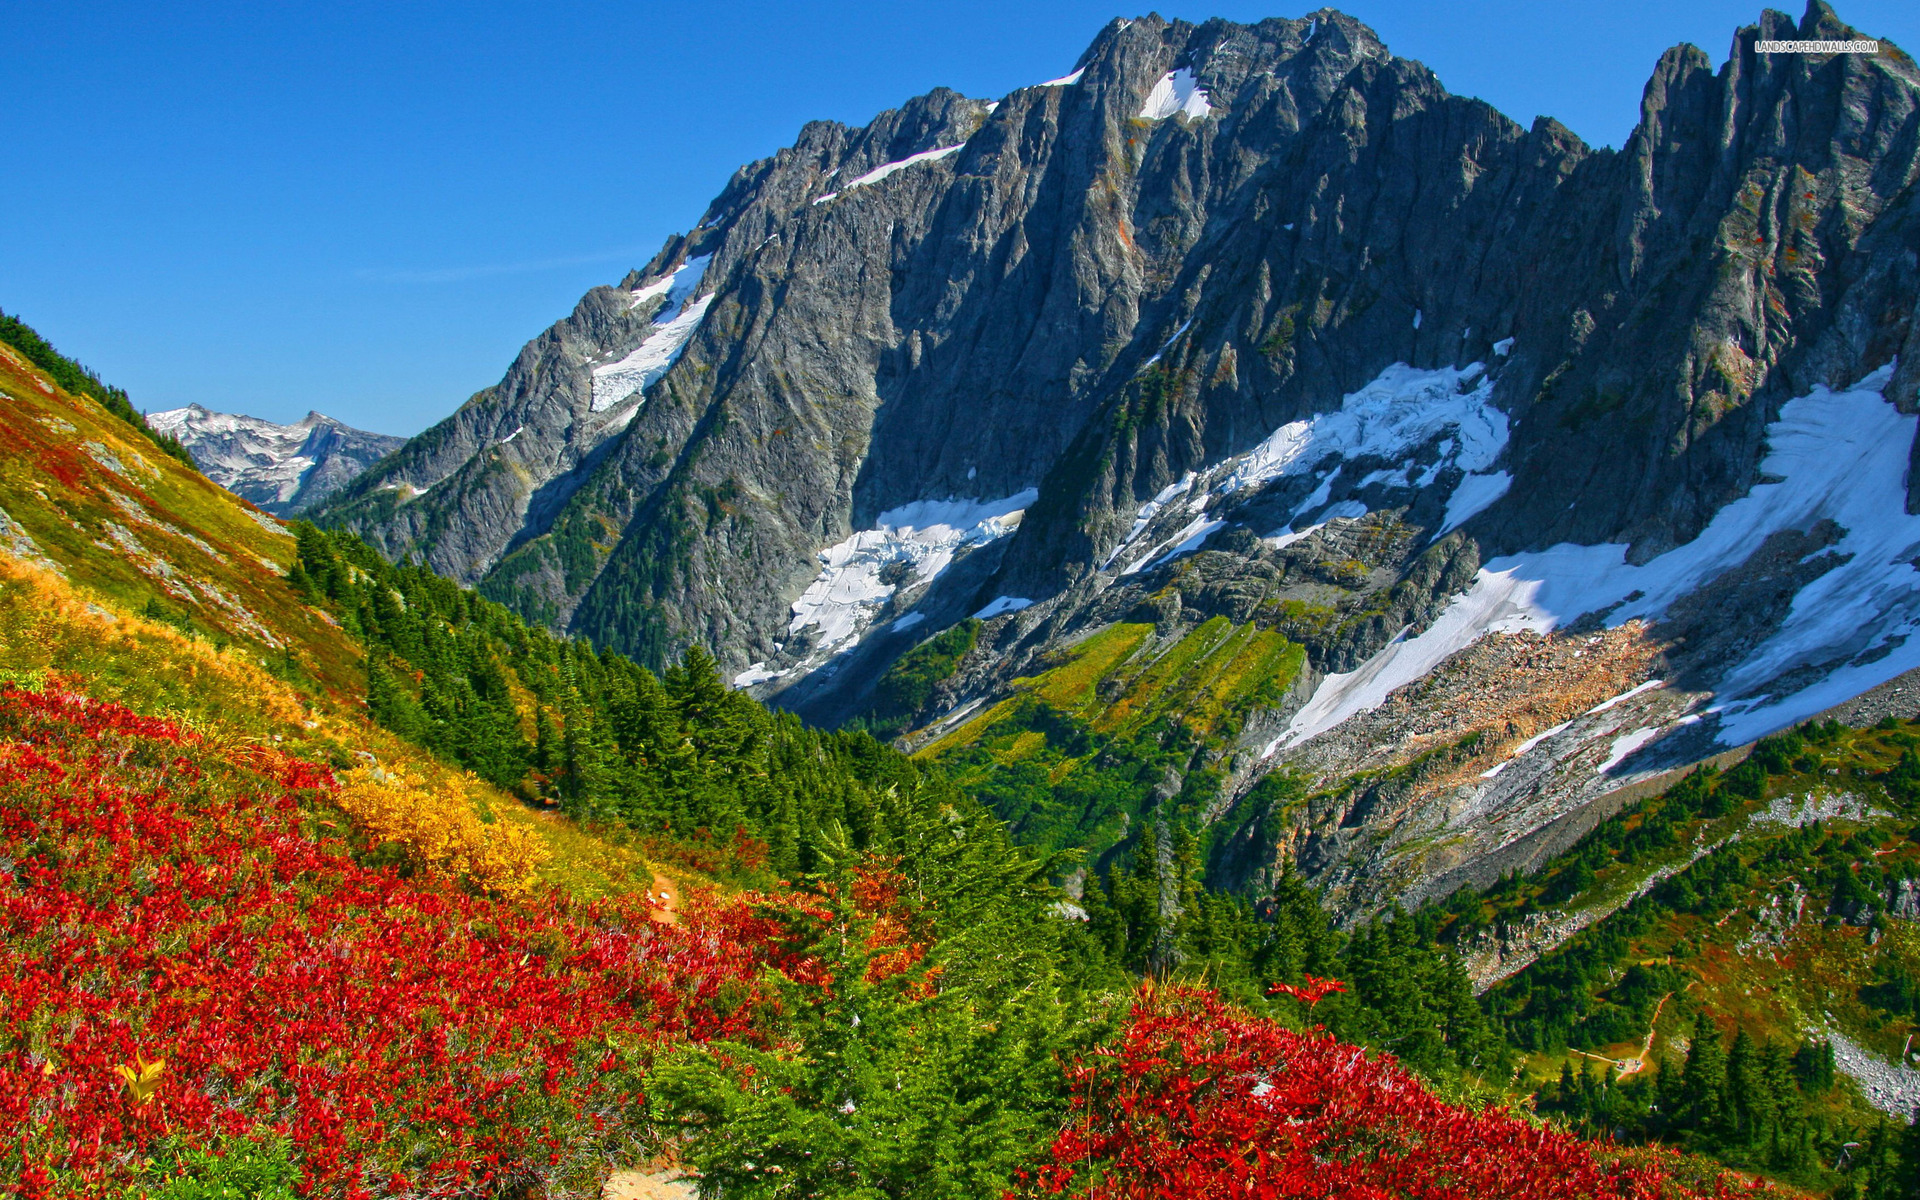 Beautiful Mountains Wallpapers Desktop 1920x1200 Wallpaper Teahub Io